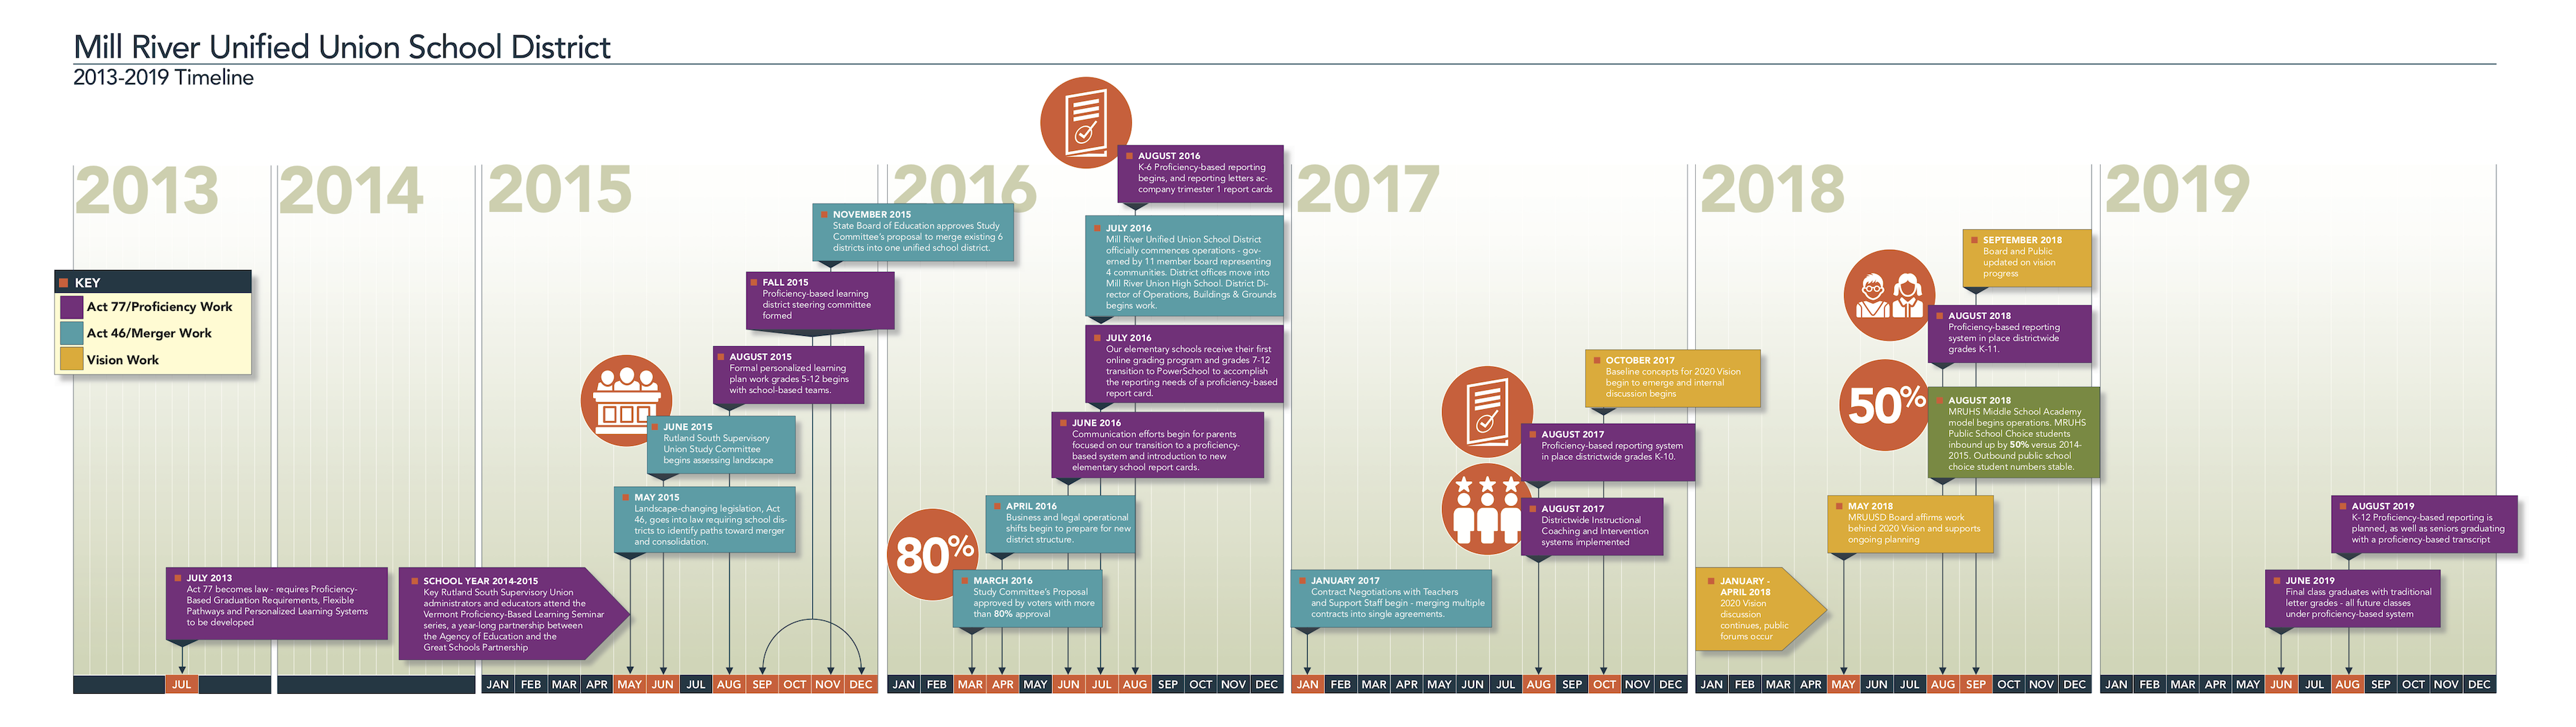 MRUUSD Timeline Full View